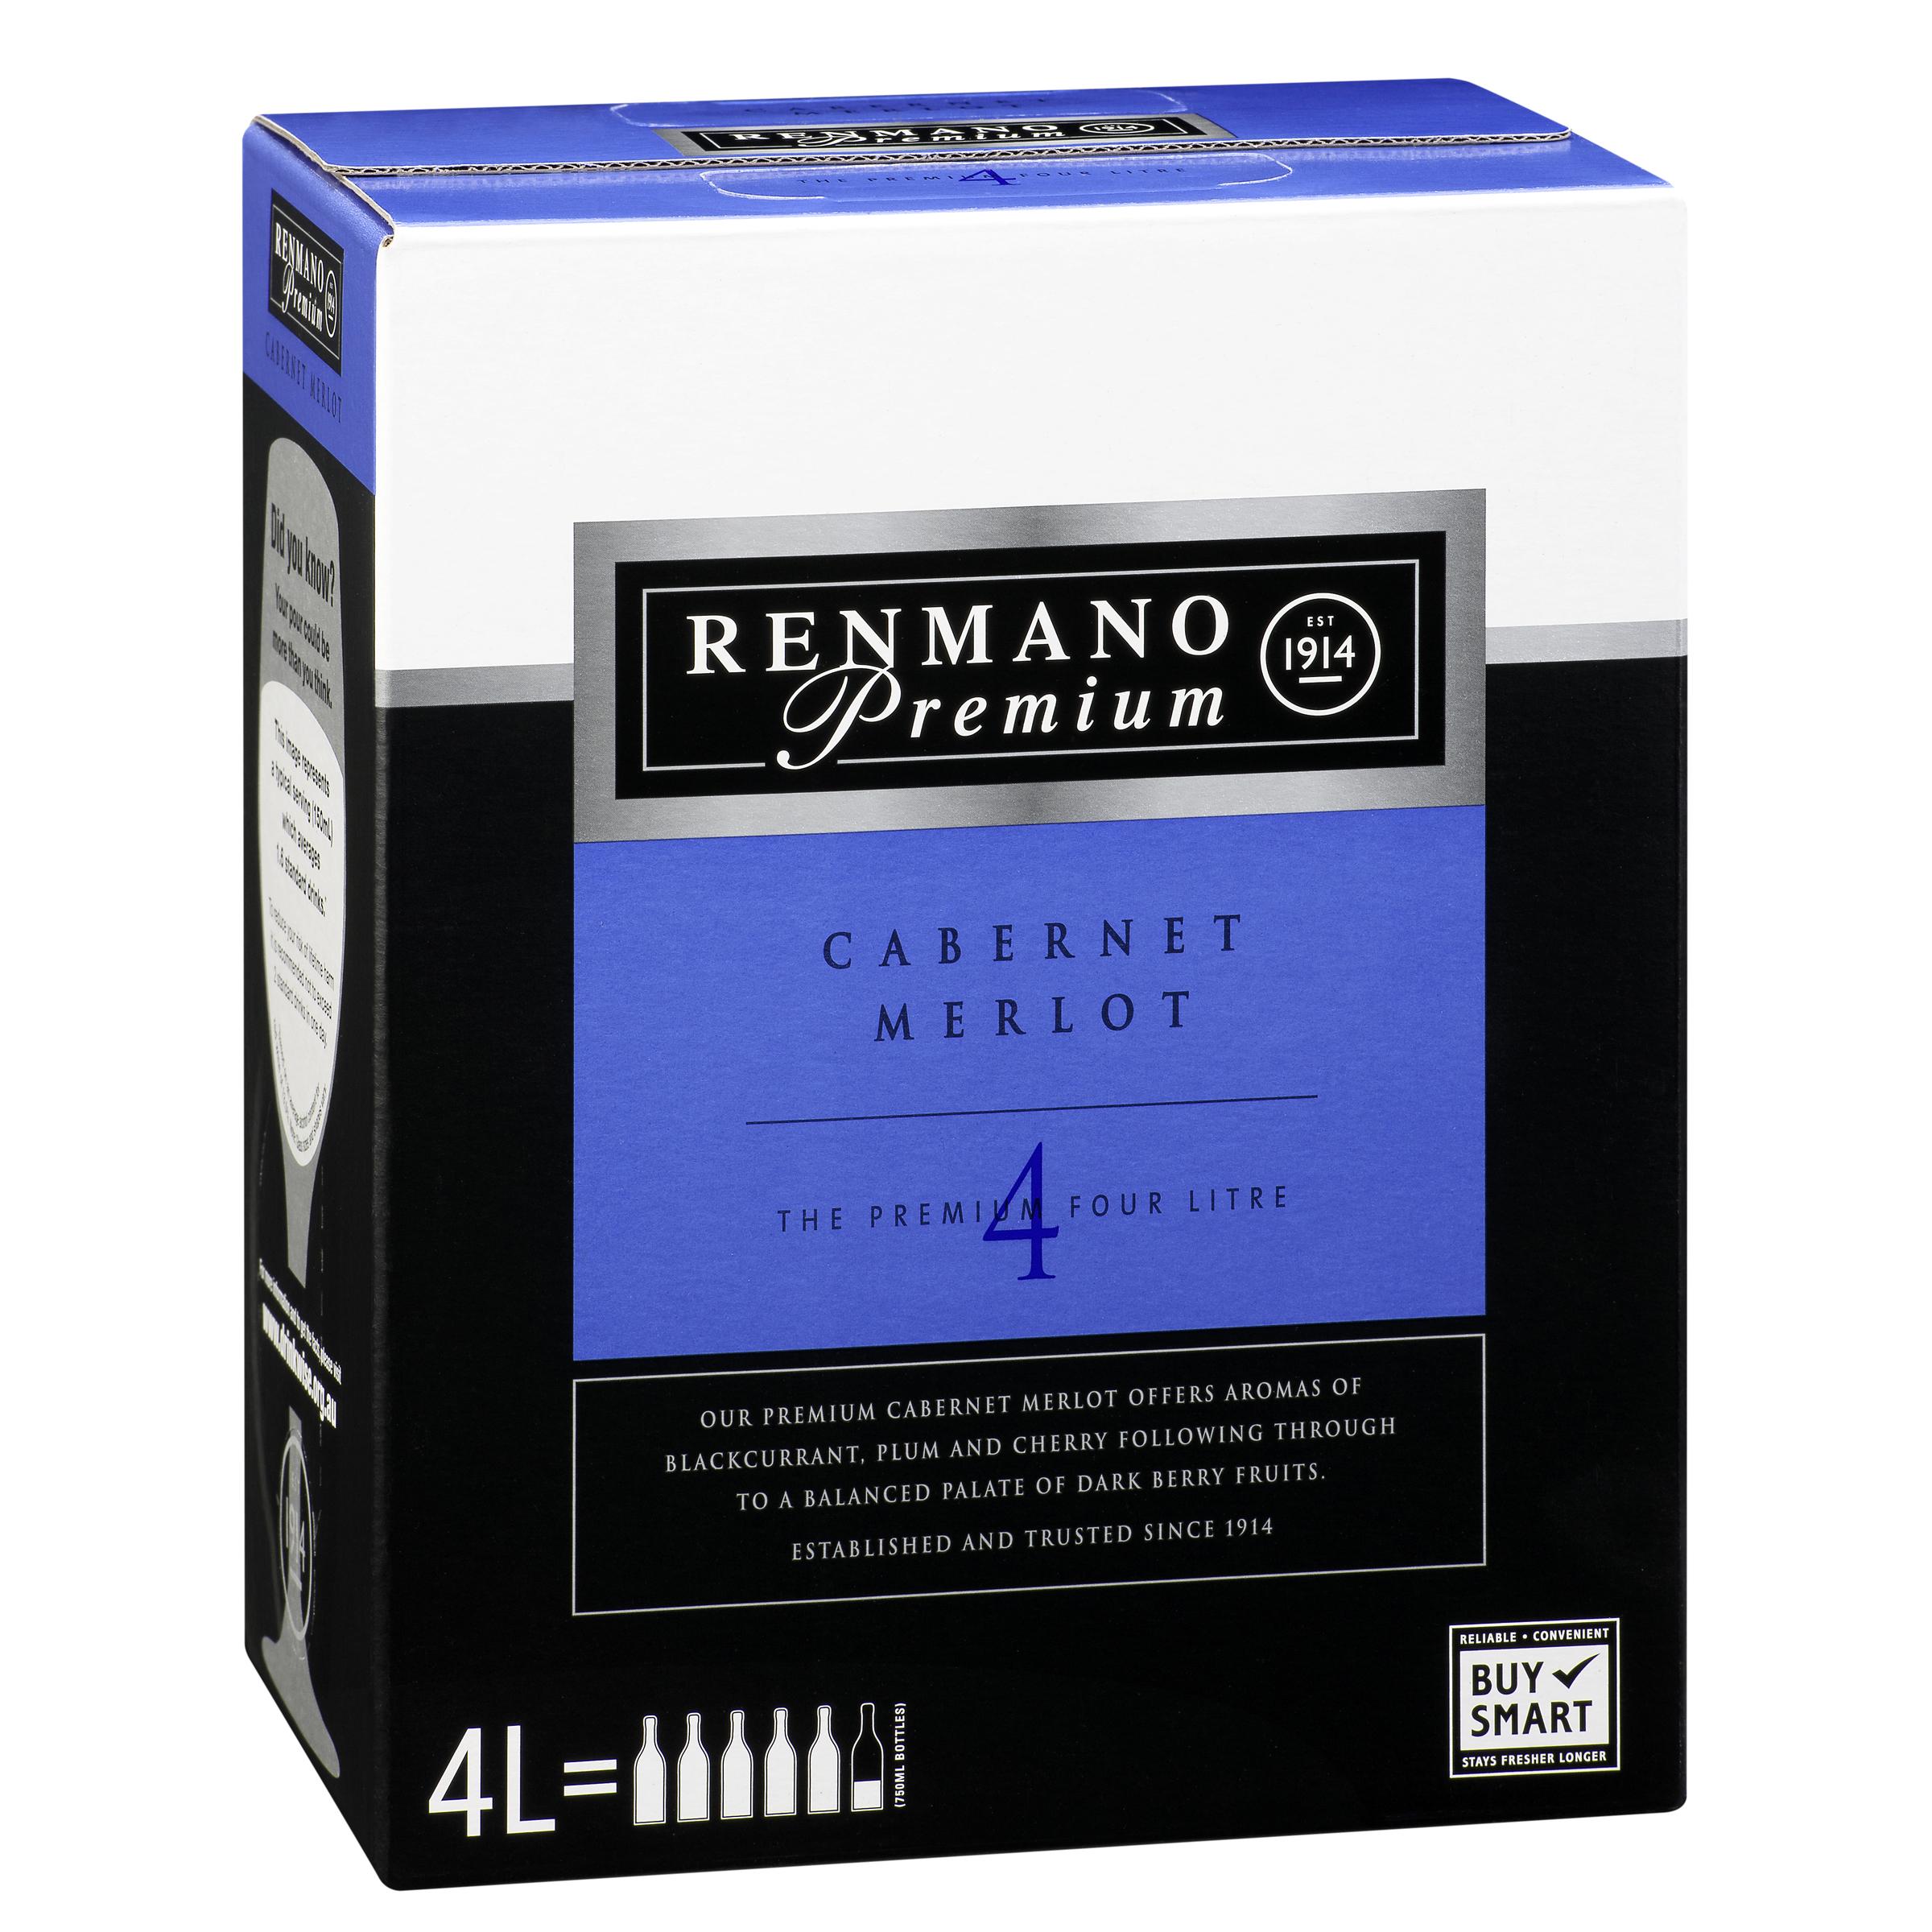 RENMANO CABERNET MERLOT